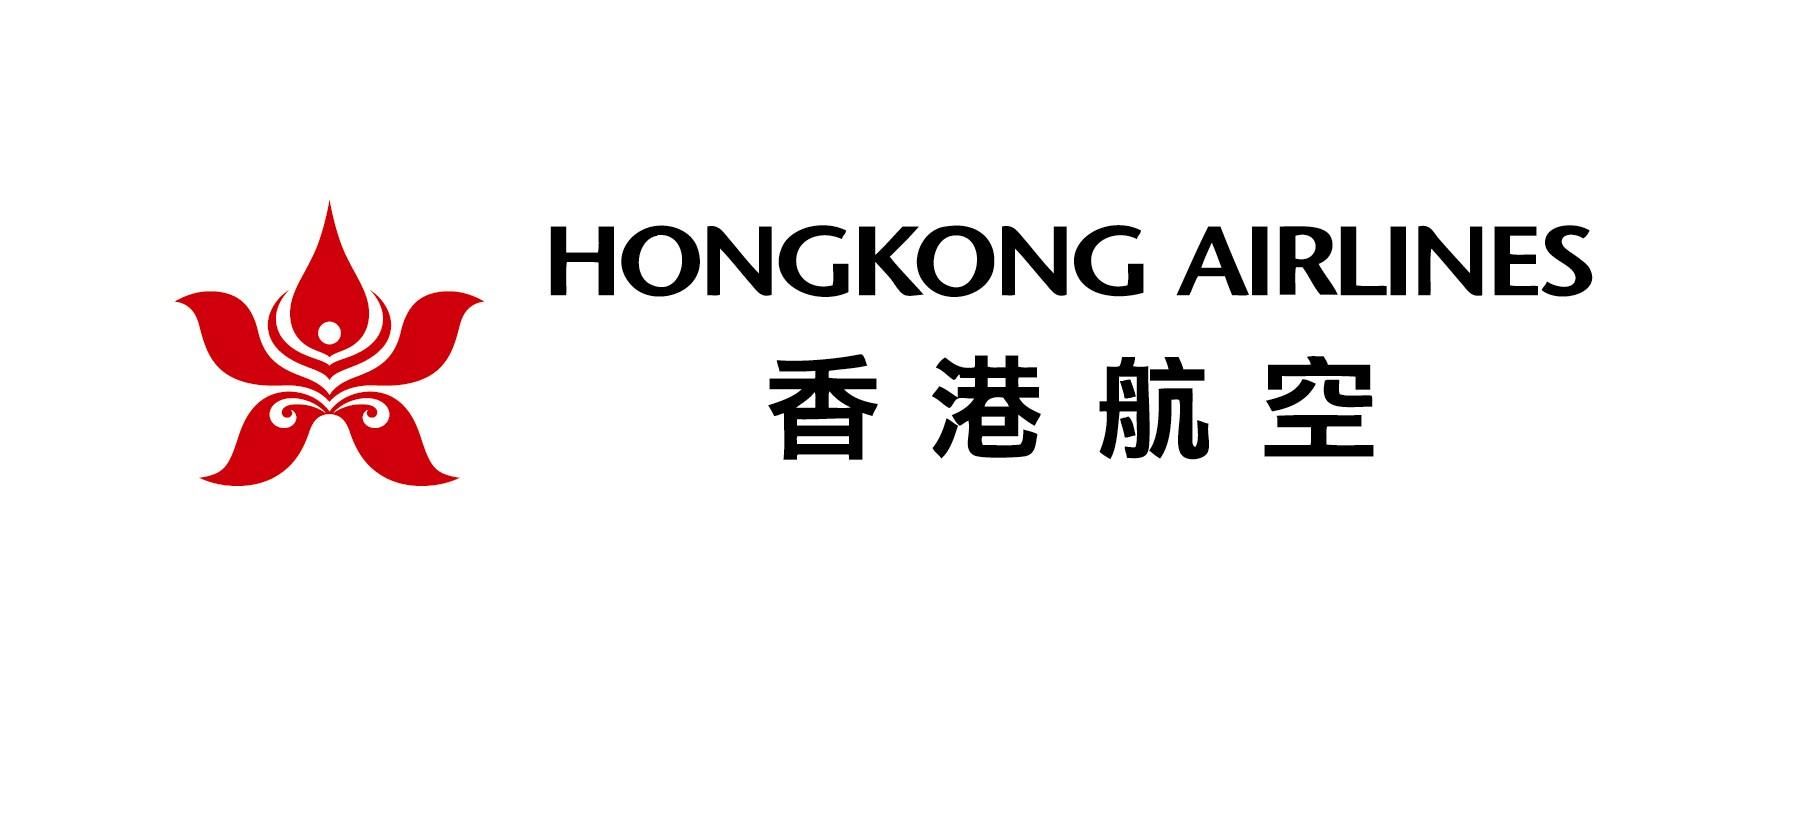 . PlusPng.com 73204afc657151d592bfee53bb20ef49.jpg PlusPng.com  - Hong Kong Airlines PNG